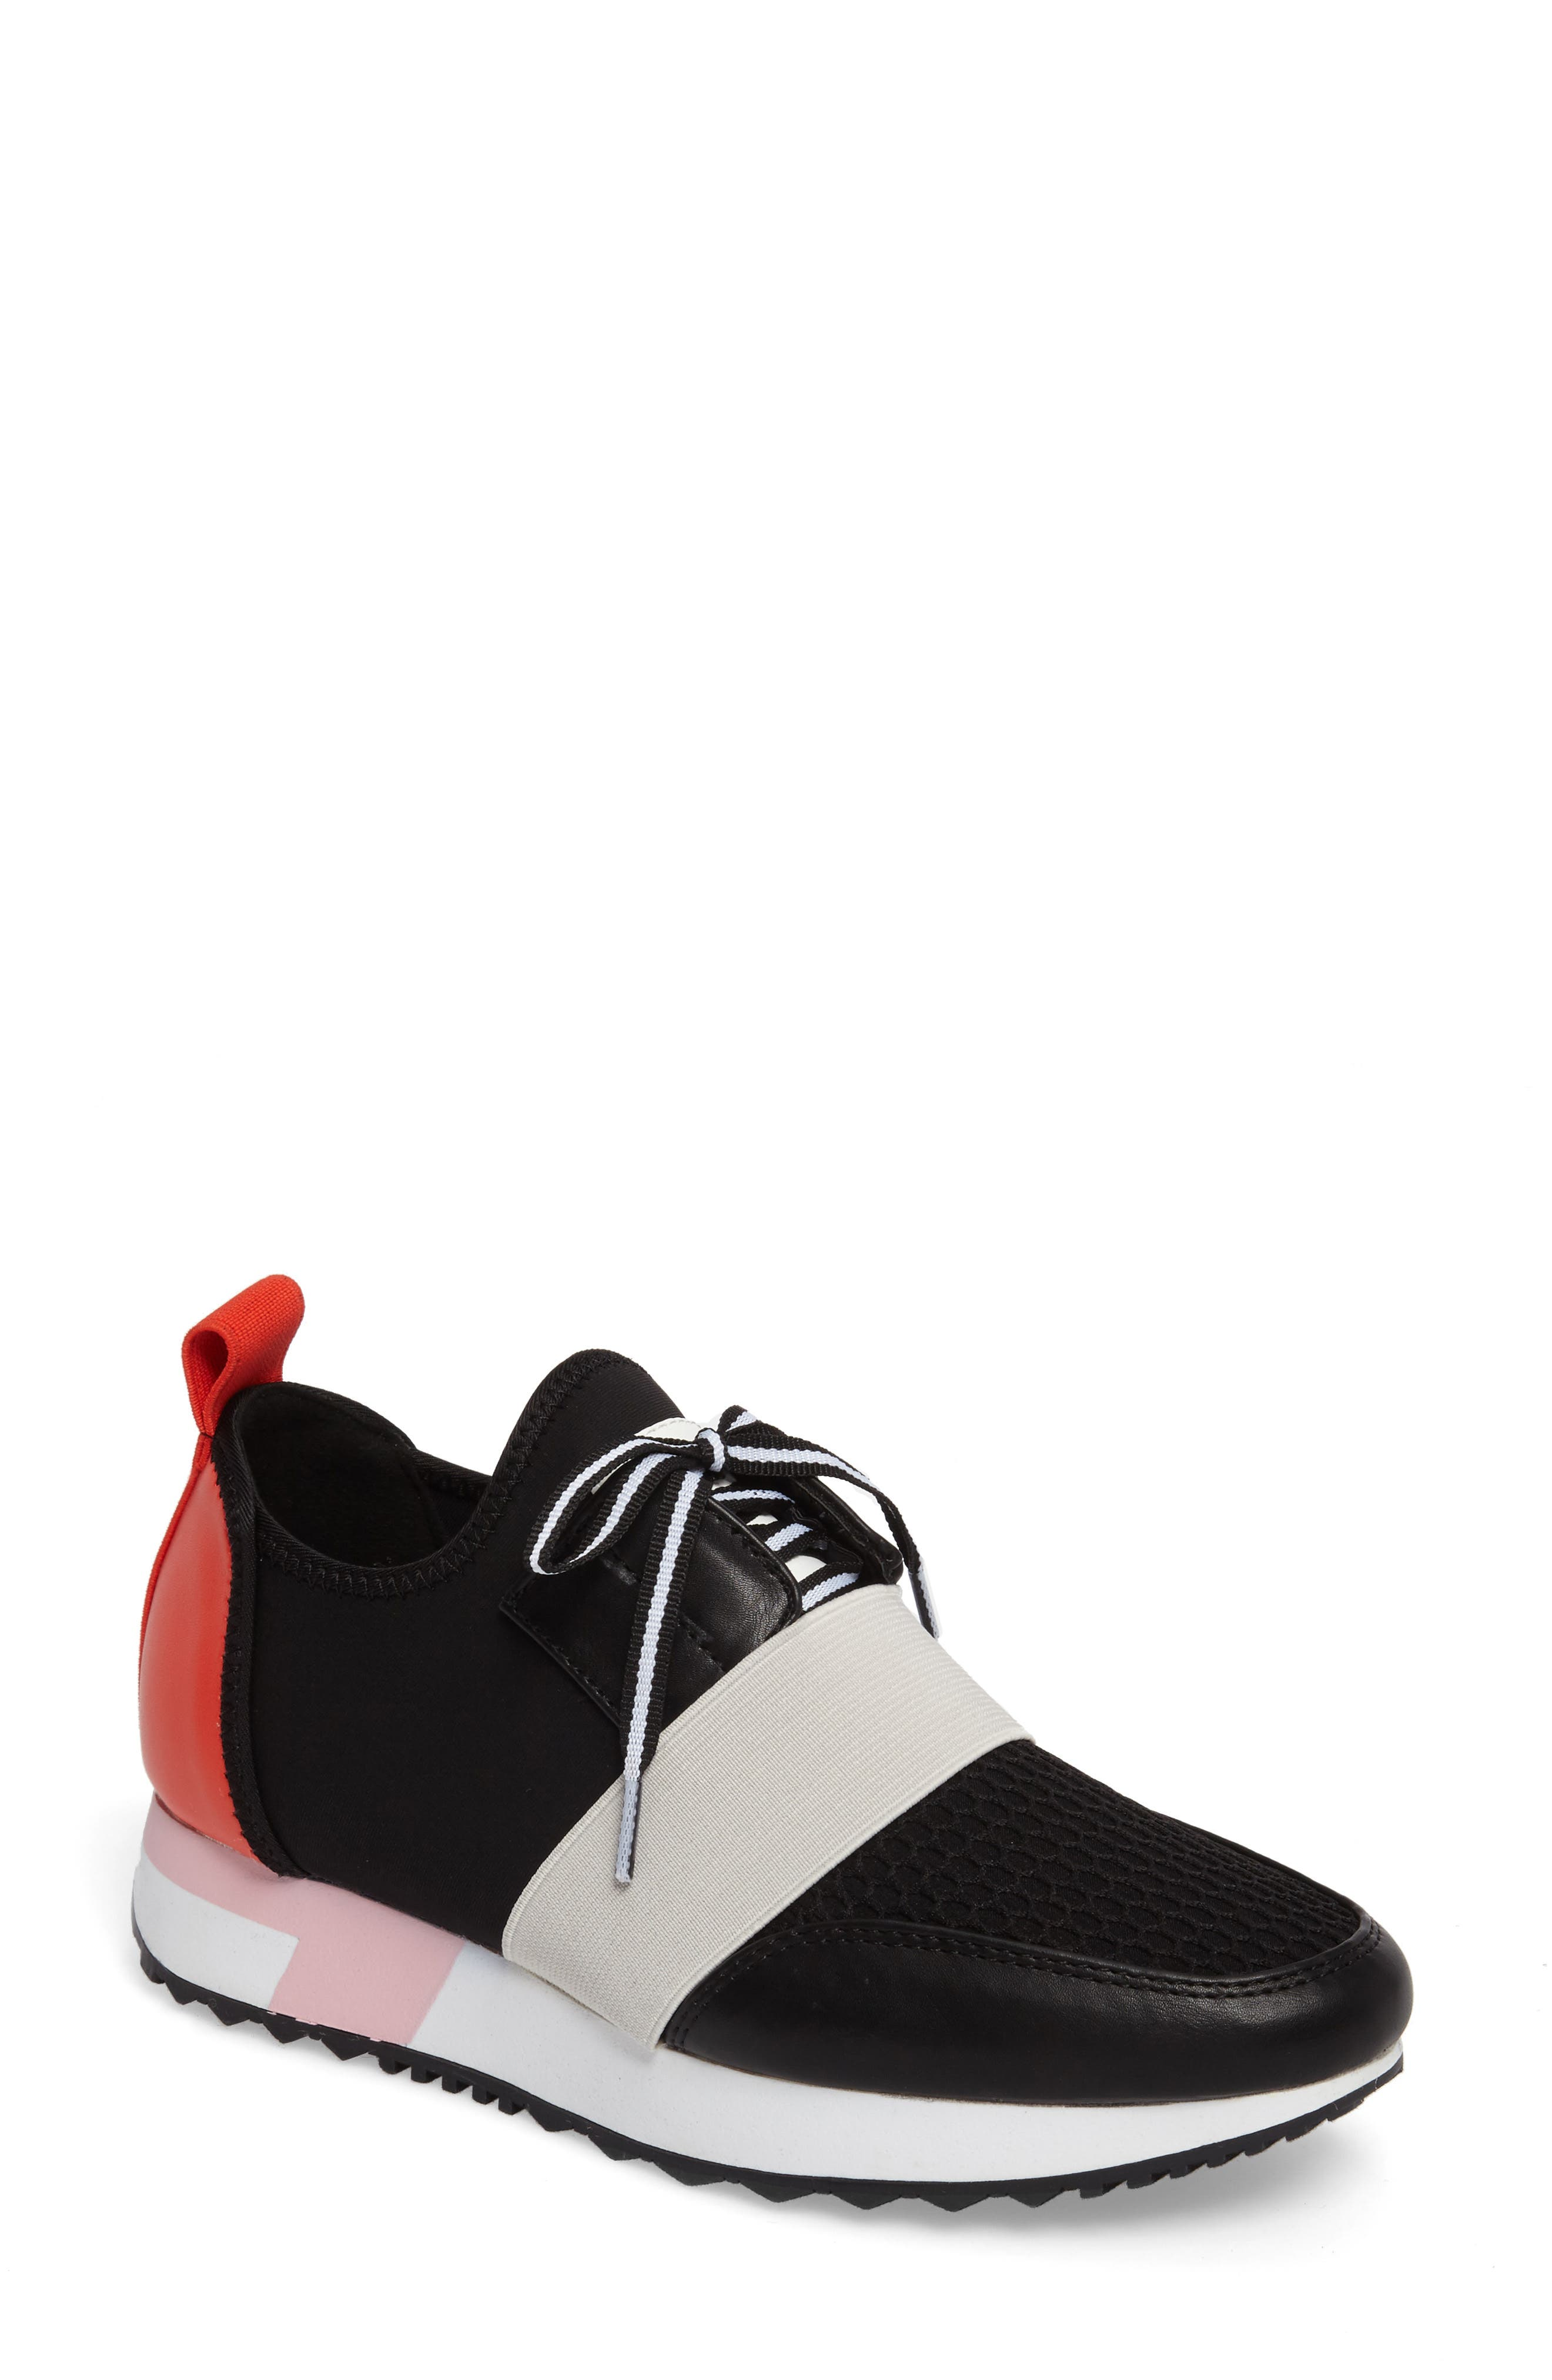 Antics Sneaker,                             Main thumbnail 1, color,                             015